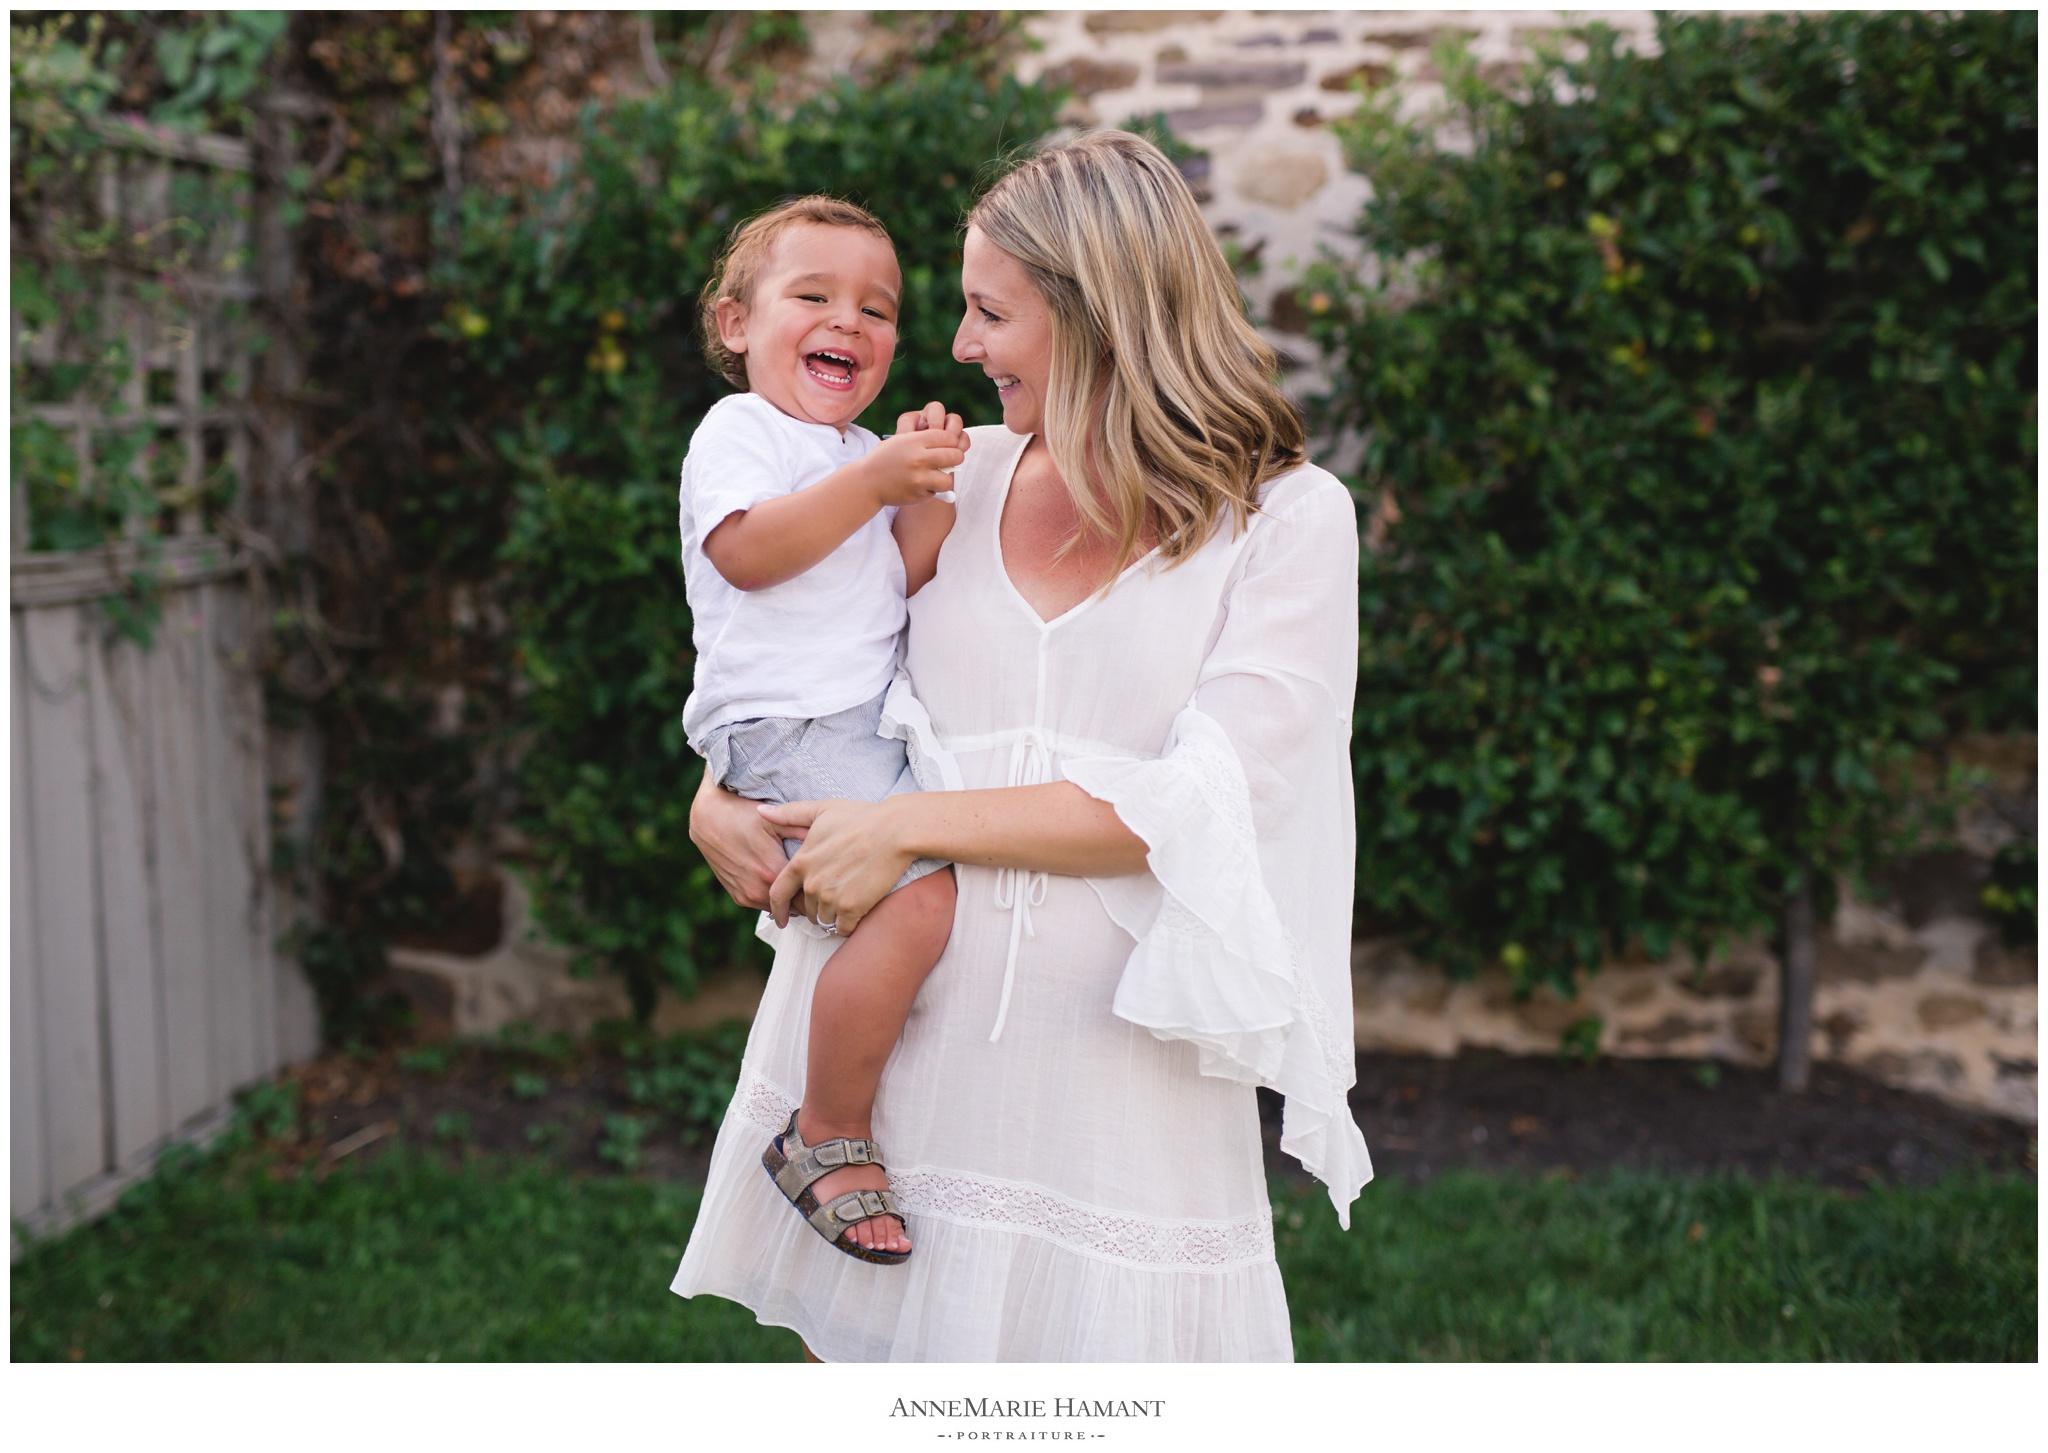 Bucks County Family, Child, Maternity Photographer